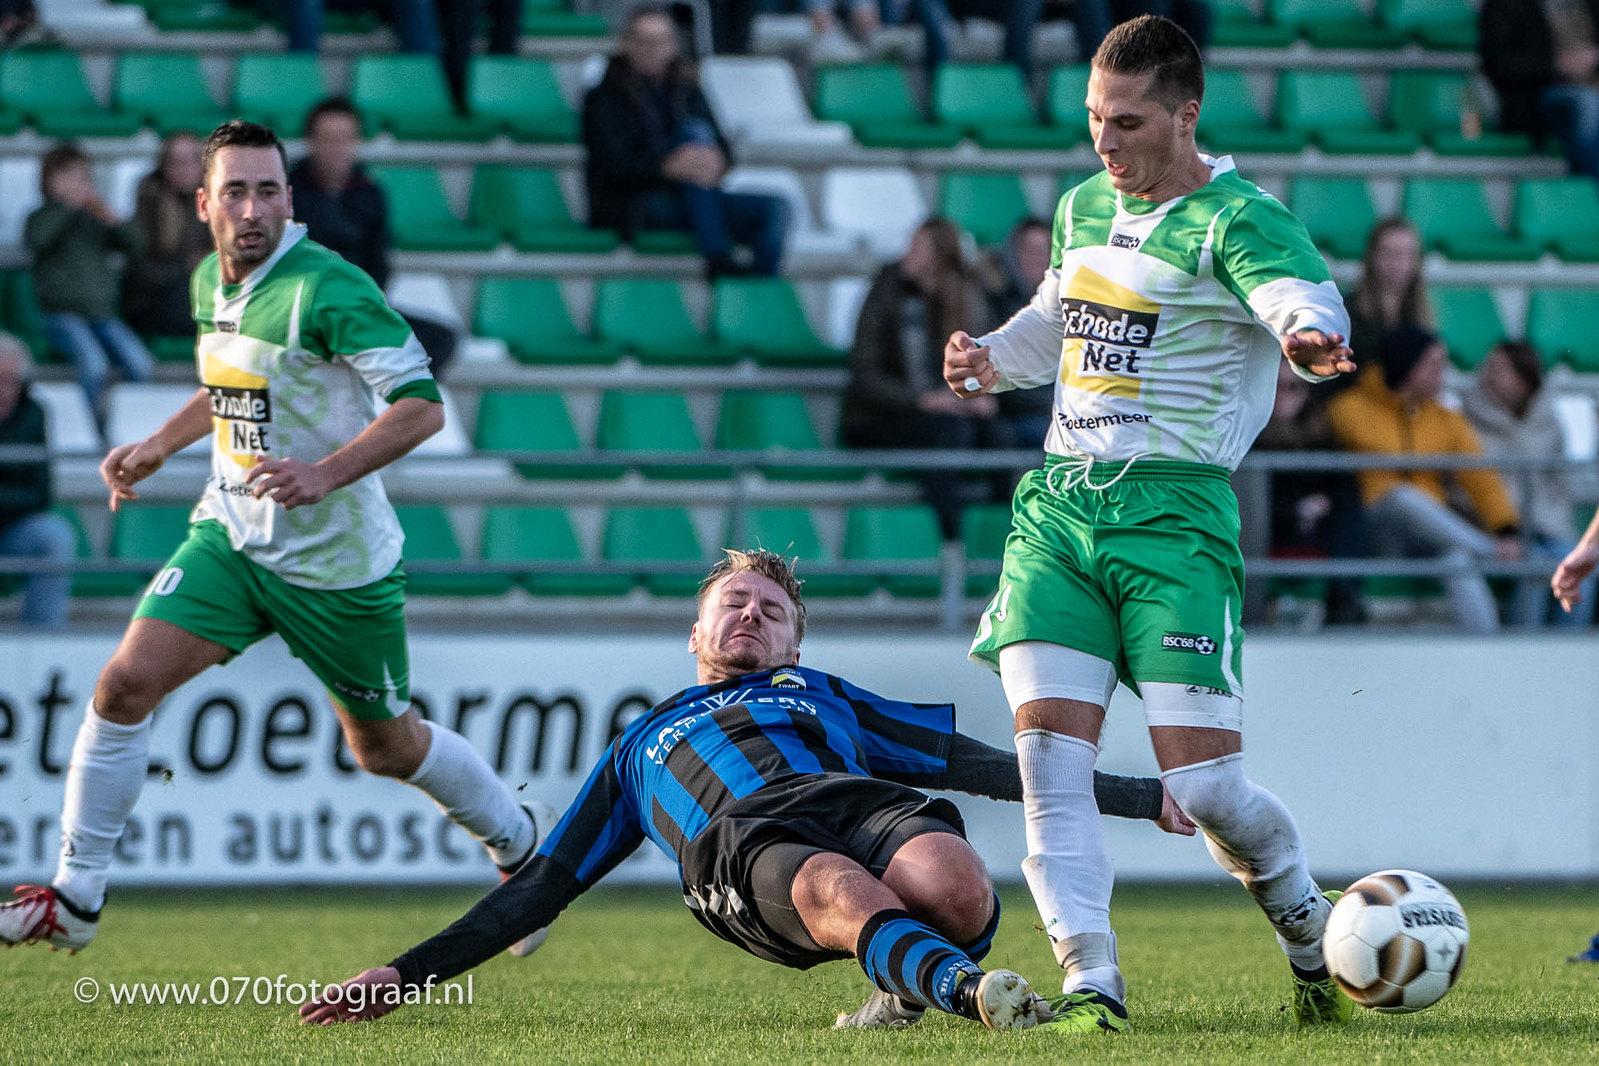 Voetbal: 2018-11-03 VV BSC '68 1 – Blauw-Zwart 1 [1-0]